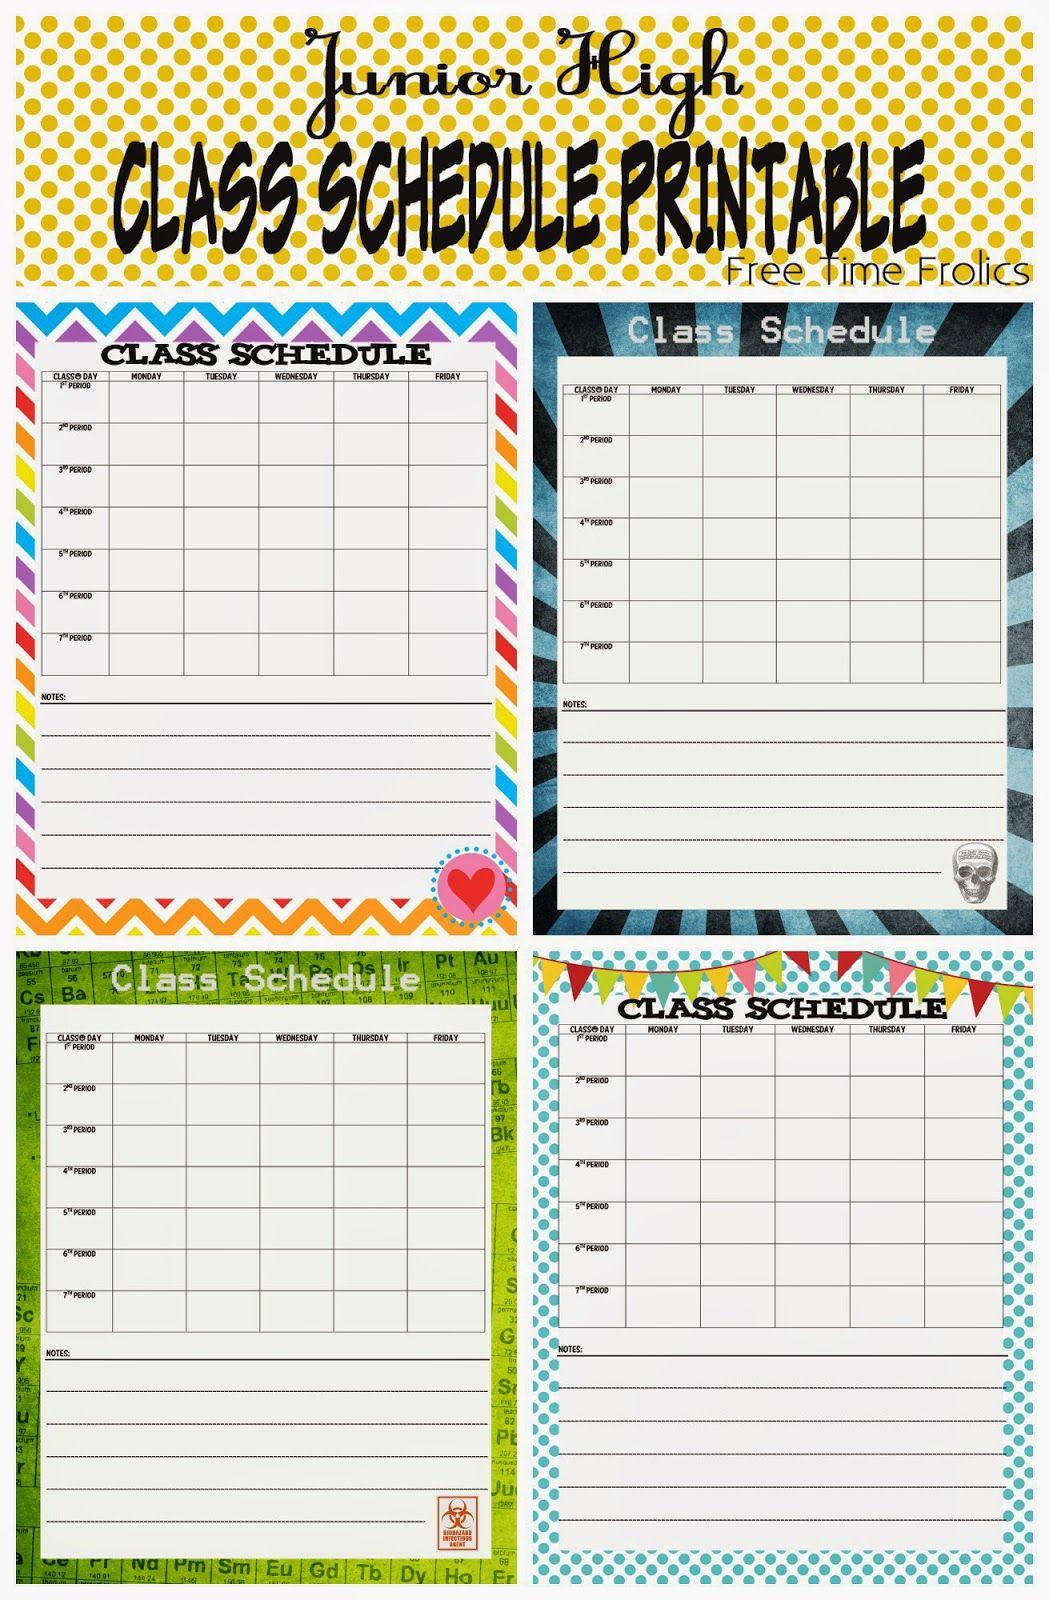 Junior High Class Schedule Printable